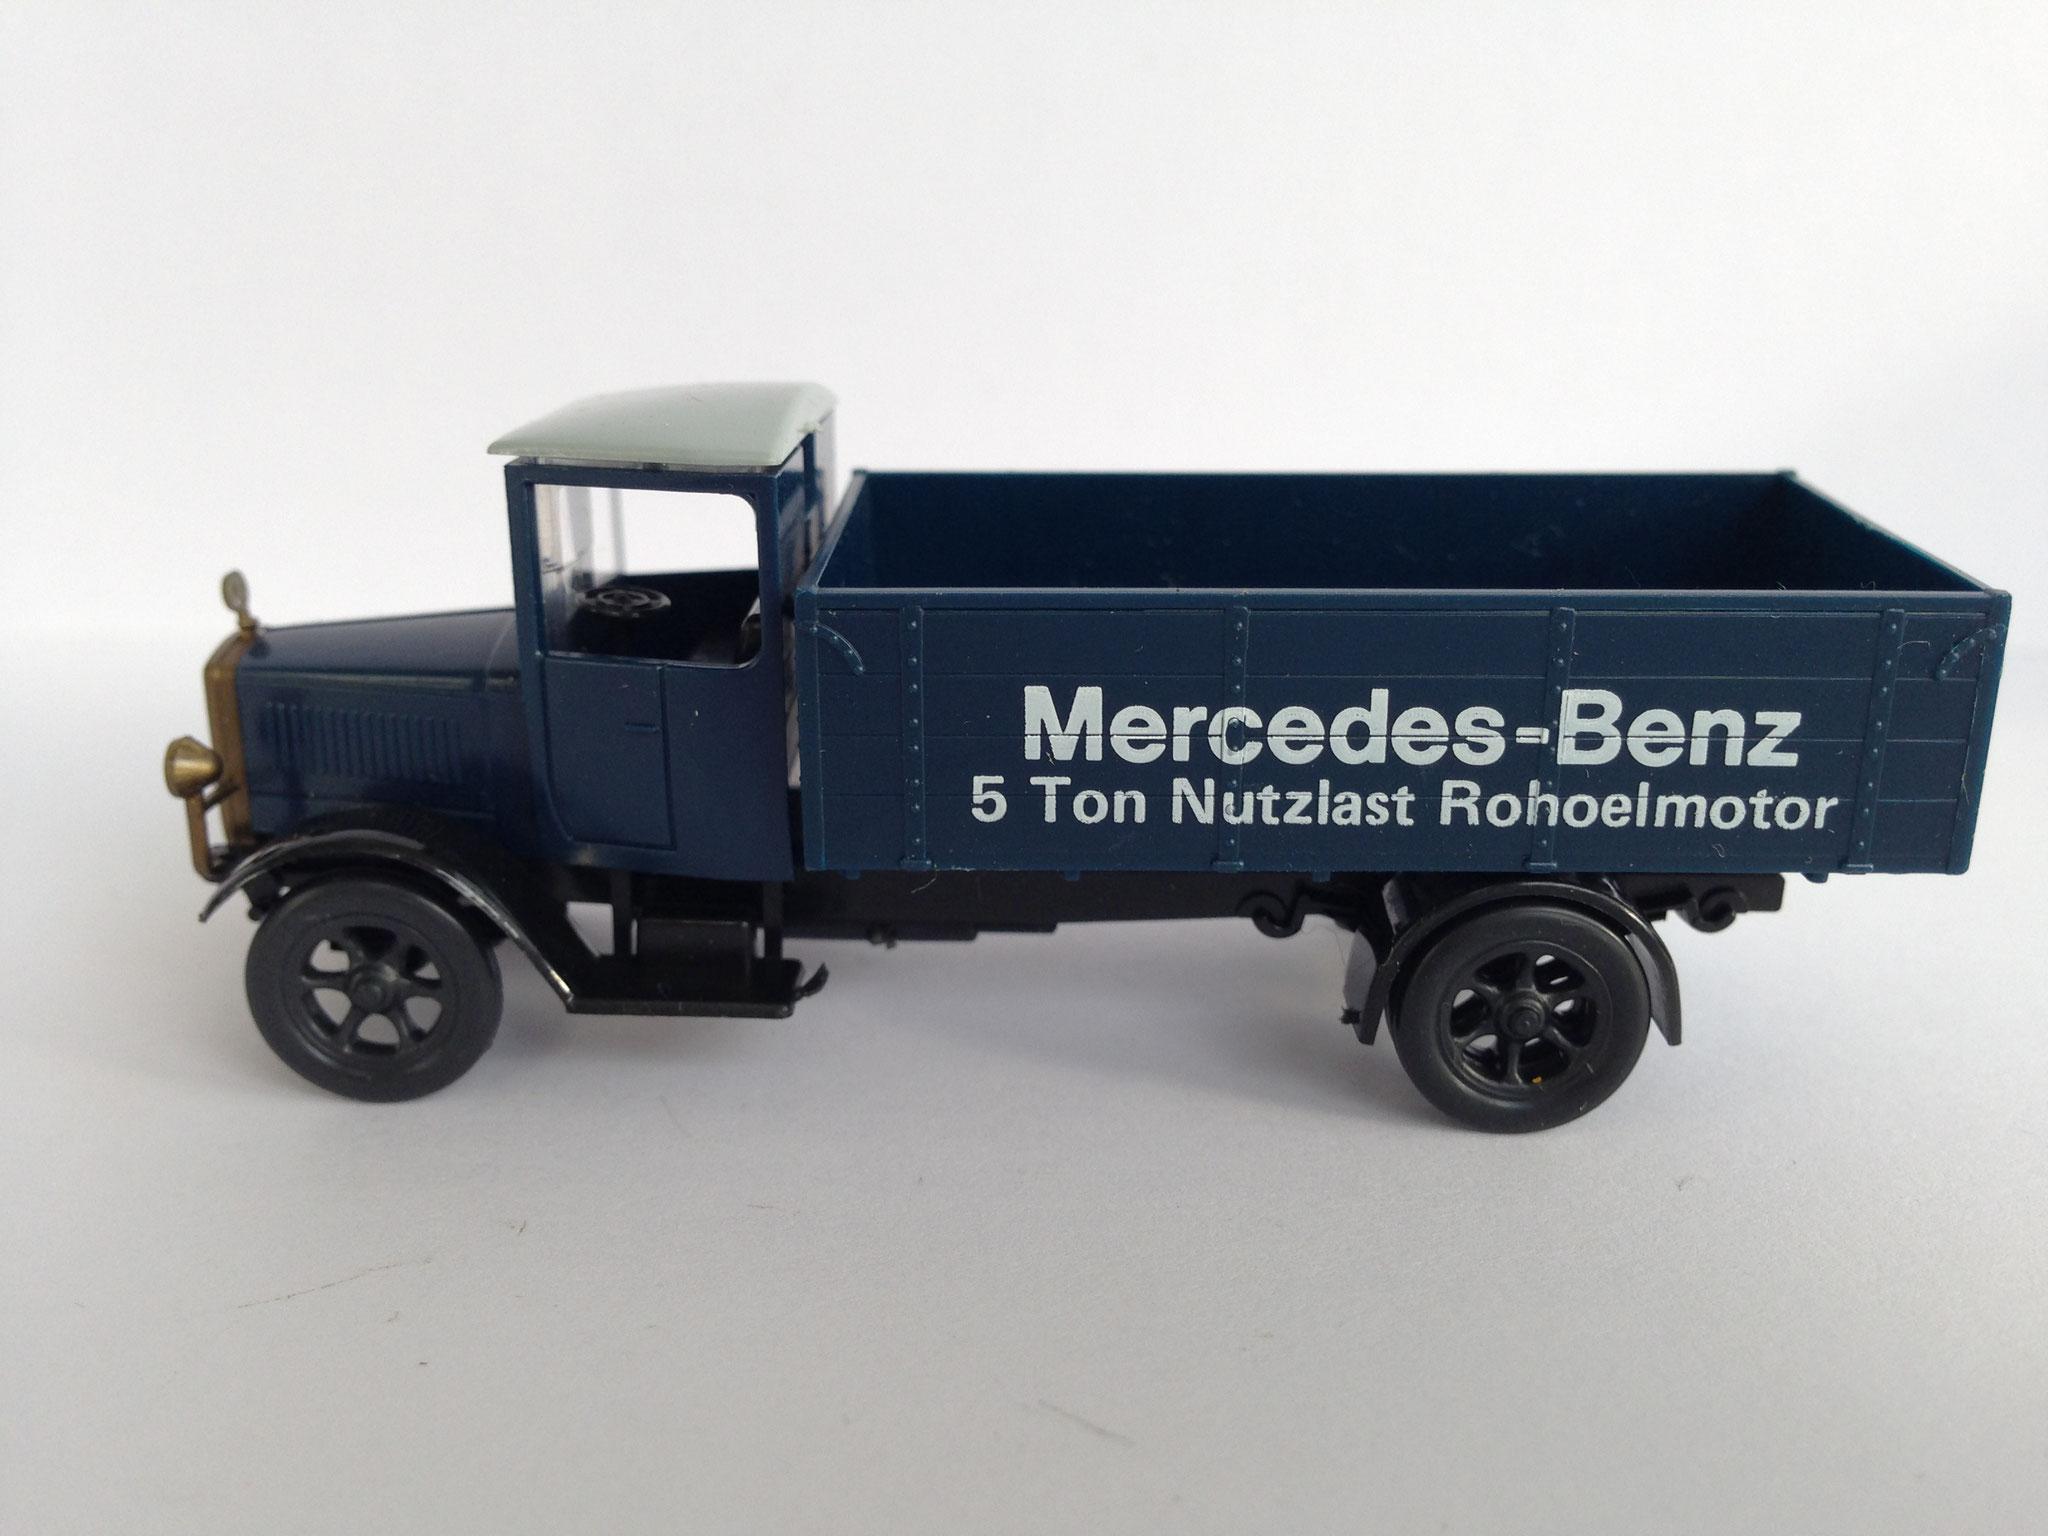 Mercedes L5 Mercedes-Benz 5 Ton Nutzlast Rohoelmotor